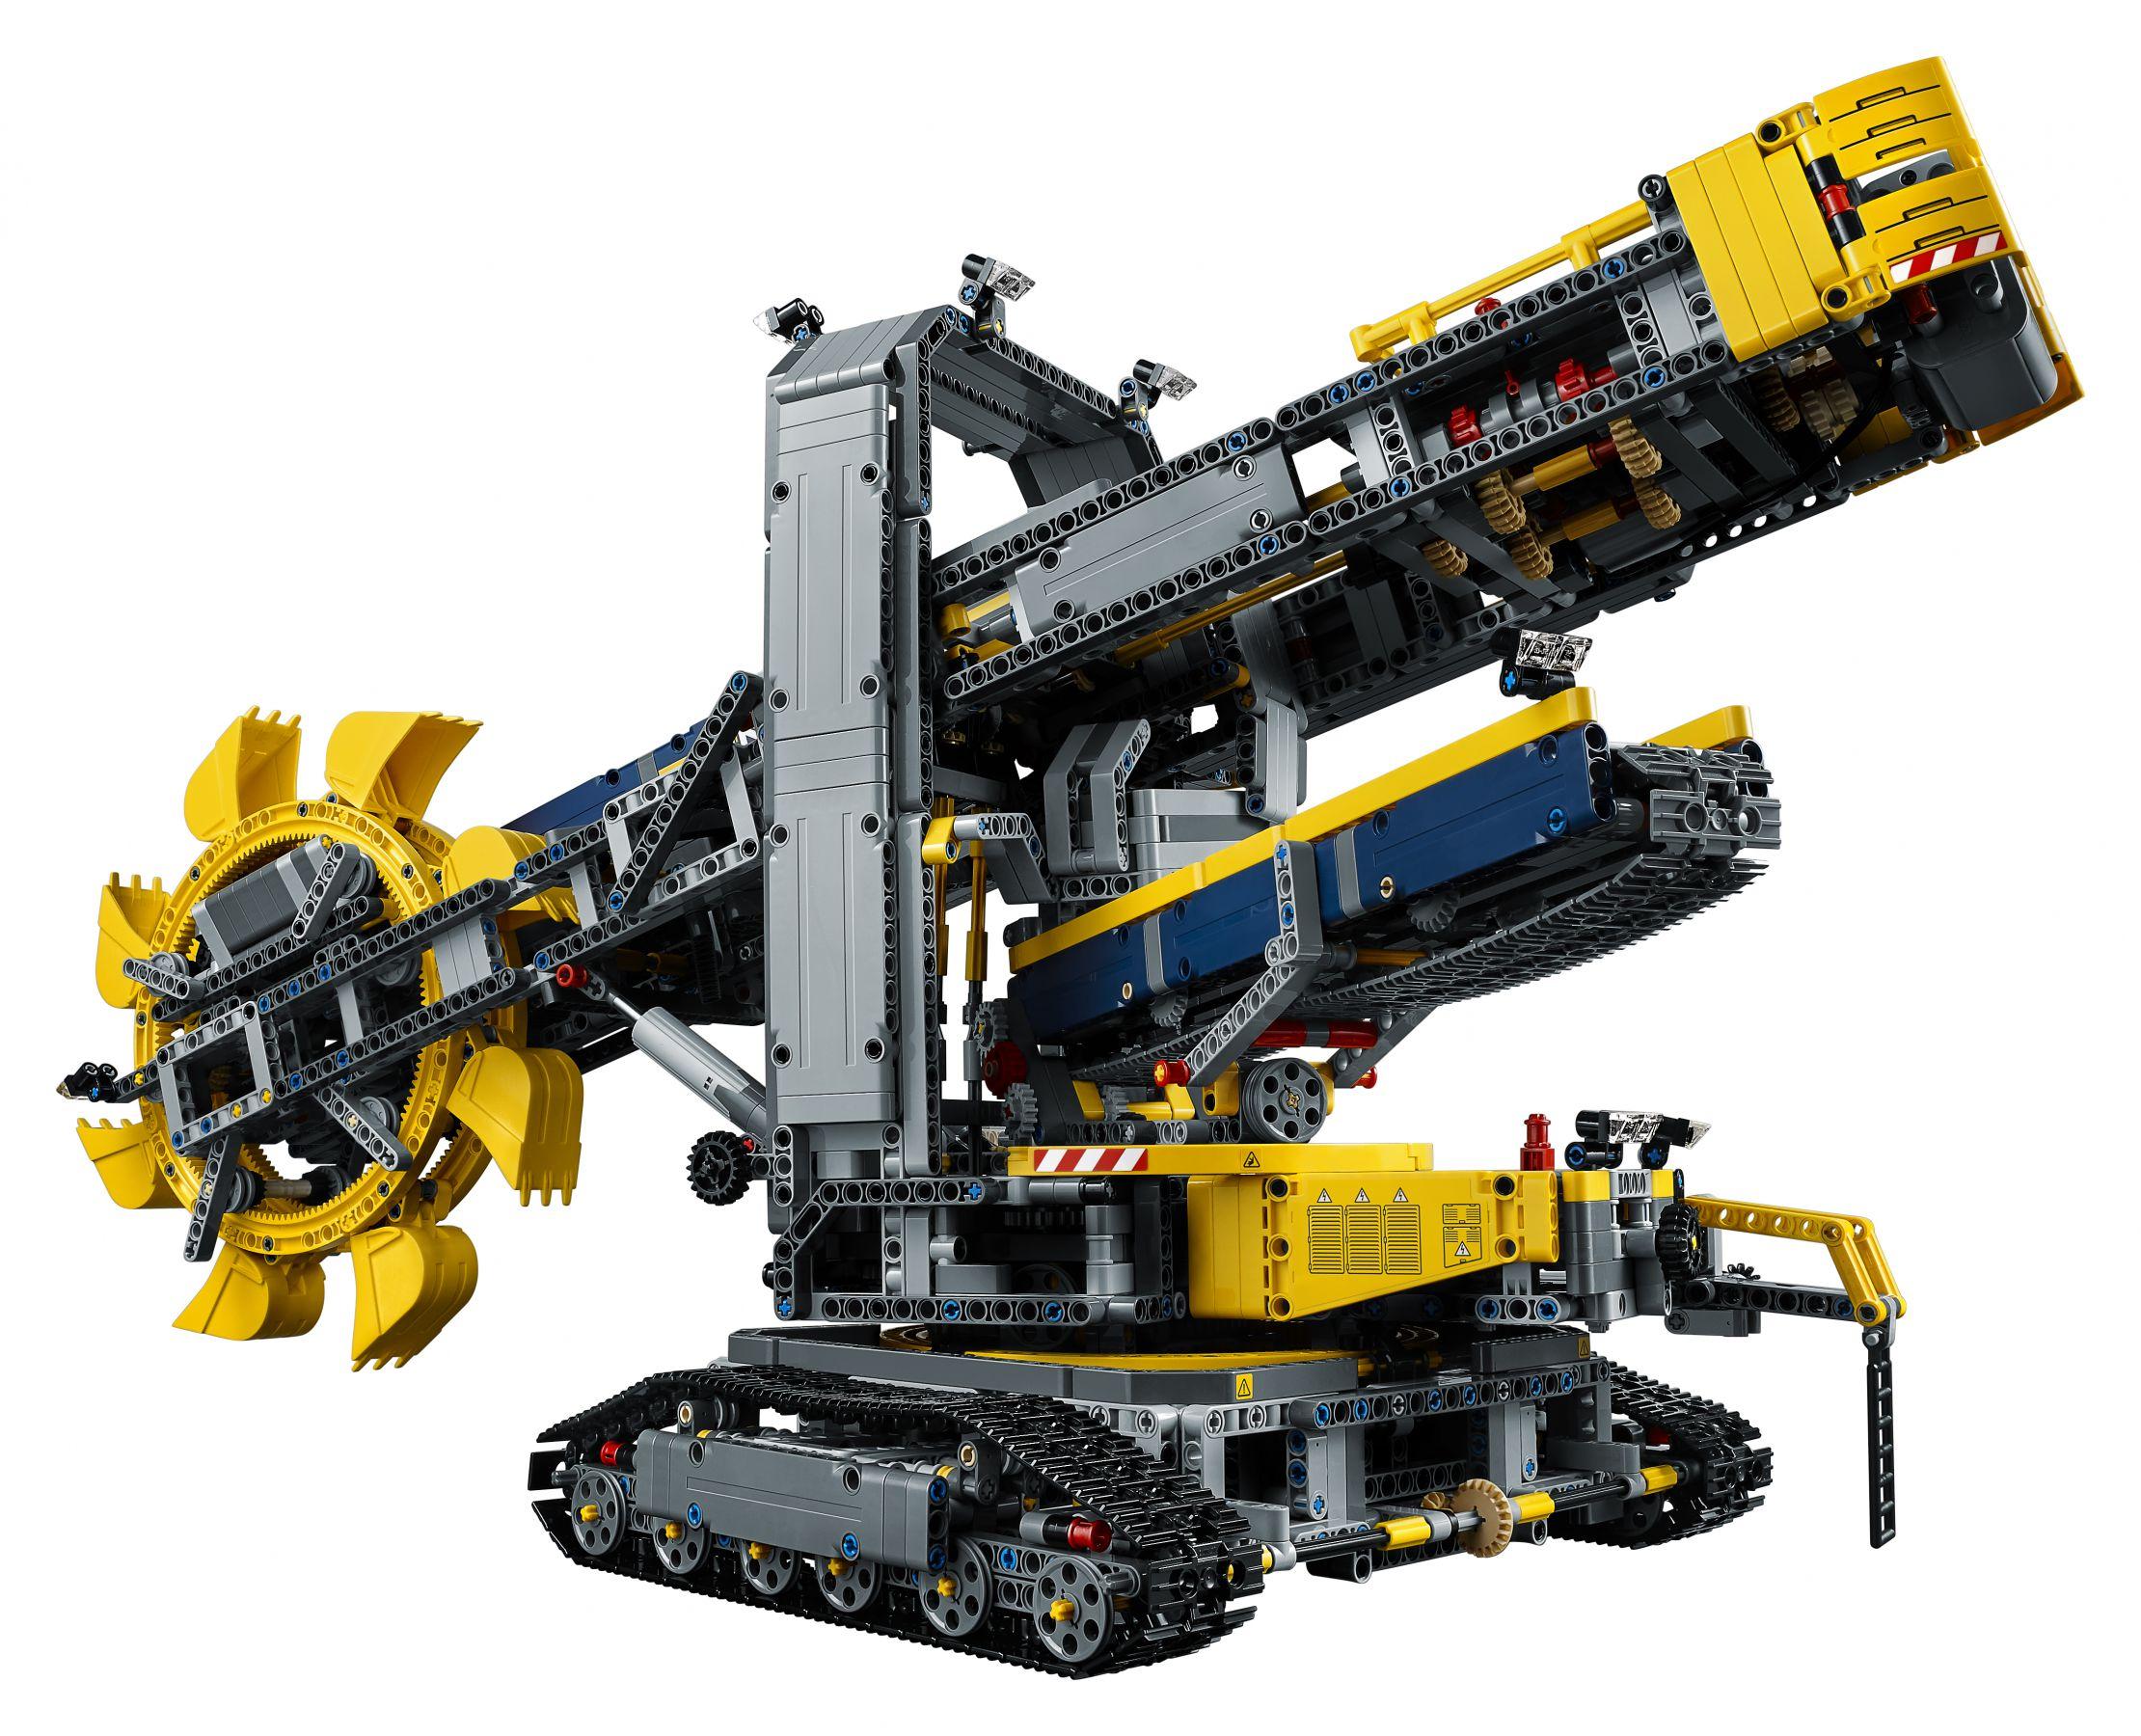 lego technic 42055 schaufelradbagger brickmerge. Black Bedroom Furniture Sets. Home Design Ideas